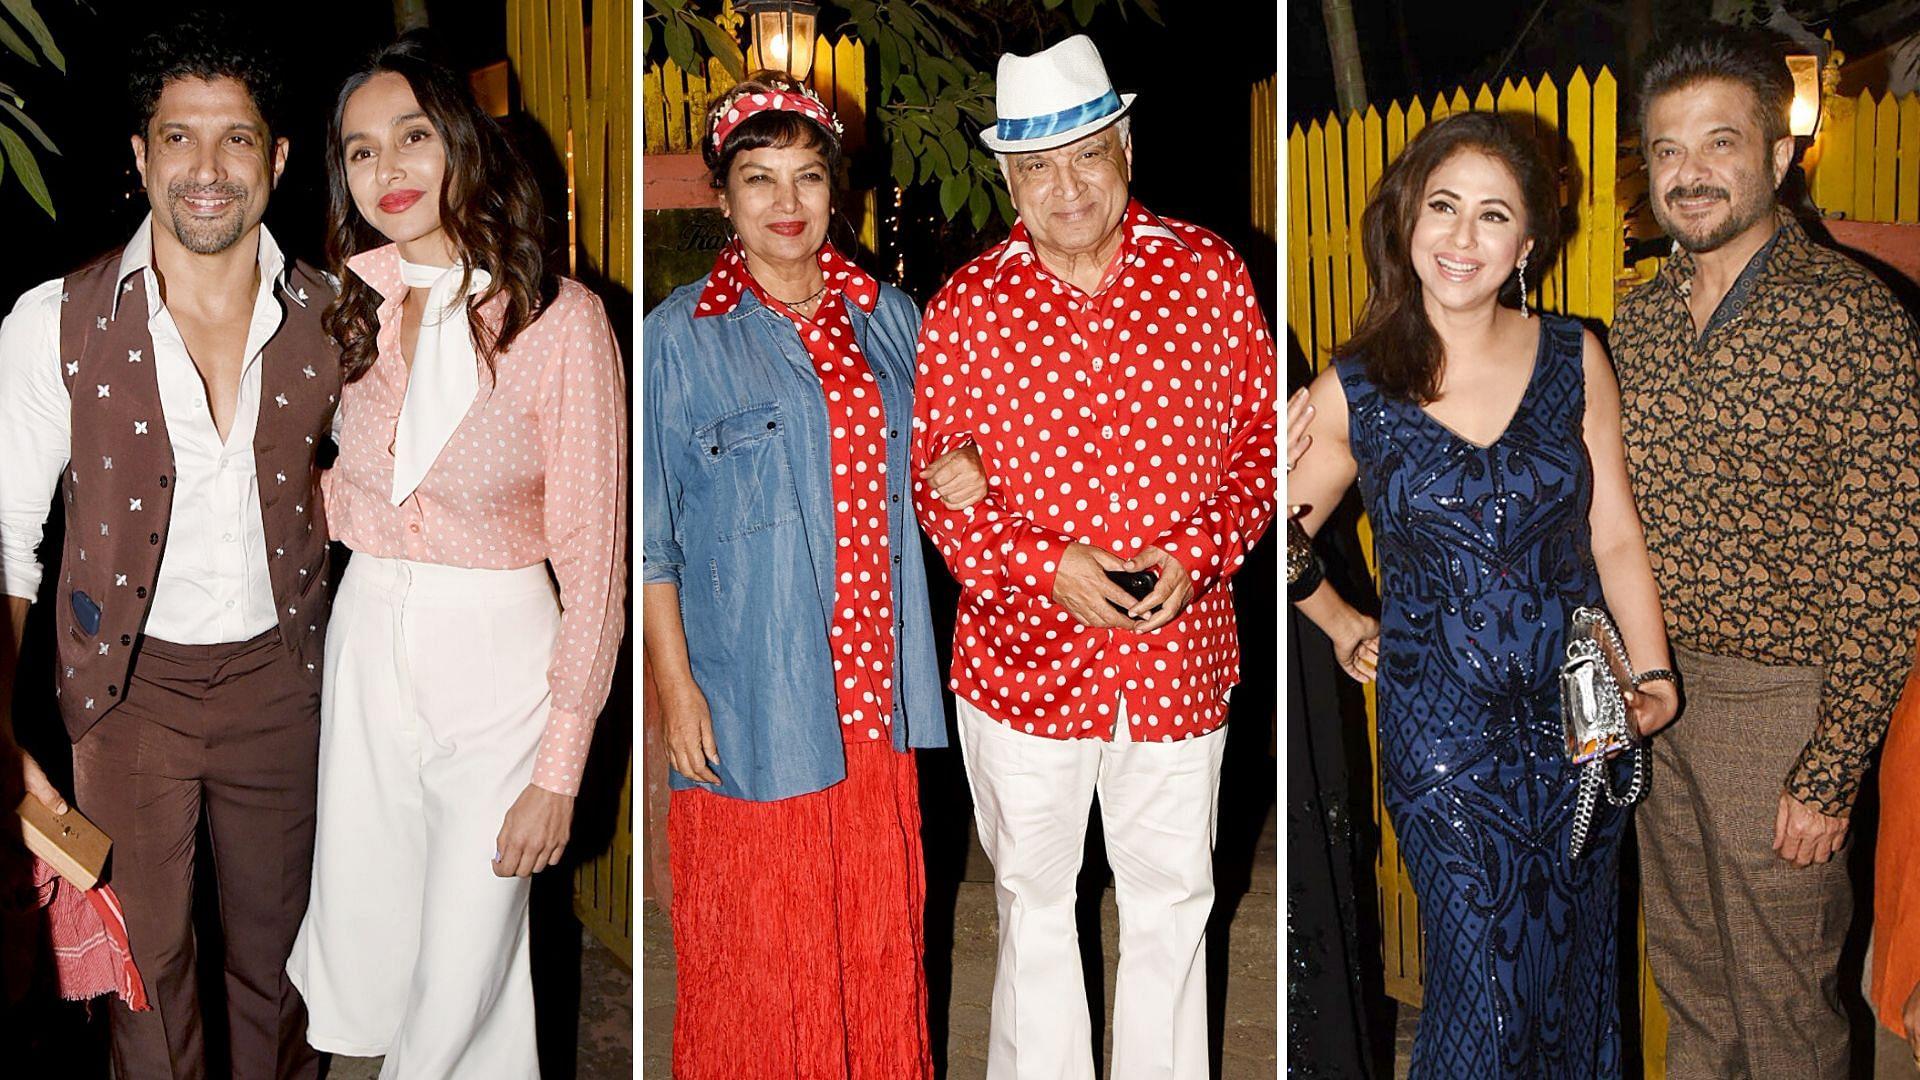 Pics: Shabana Azmi, Farhan, Anil Go Retro for Javed Akhtar's B'Day